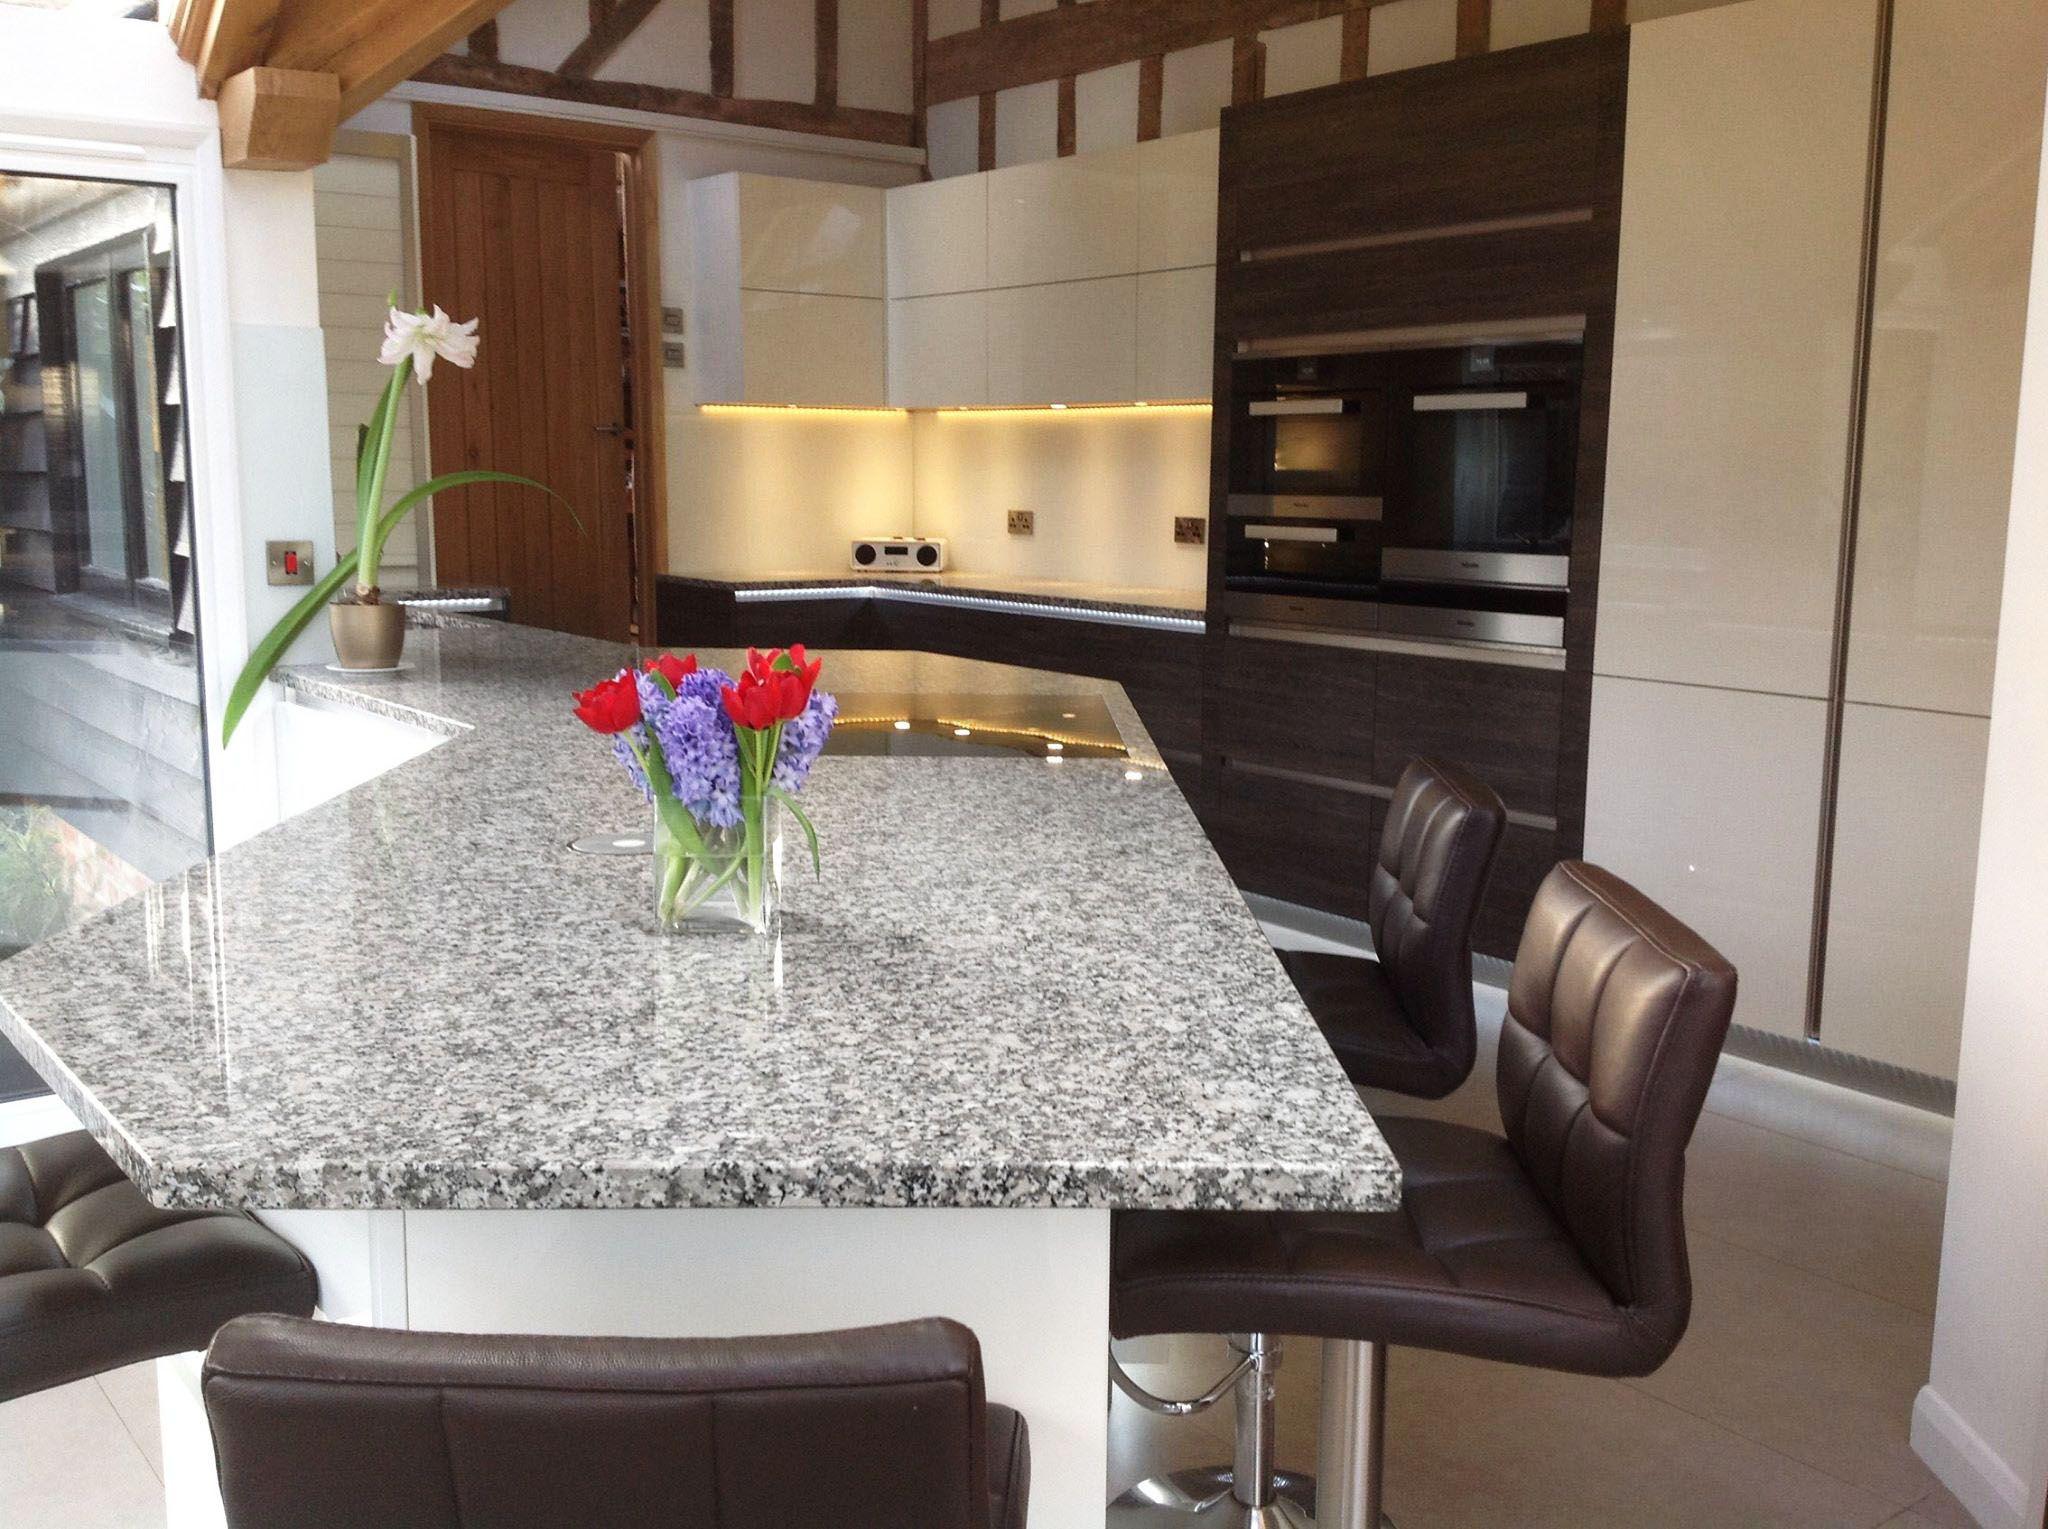 Strahlende Padang Sardo Bianco #Granit #Arbeitsplatten verbreiten ...